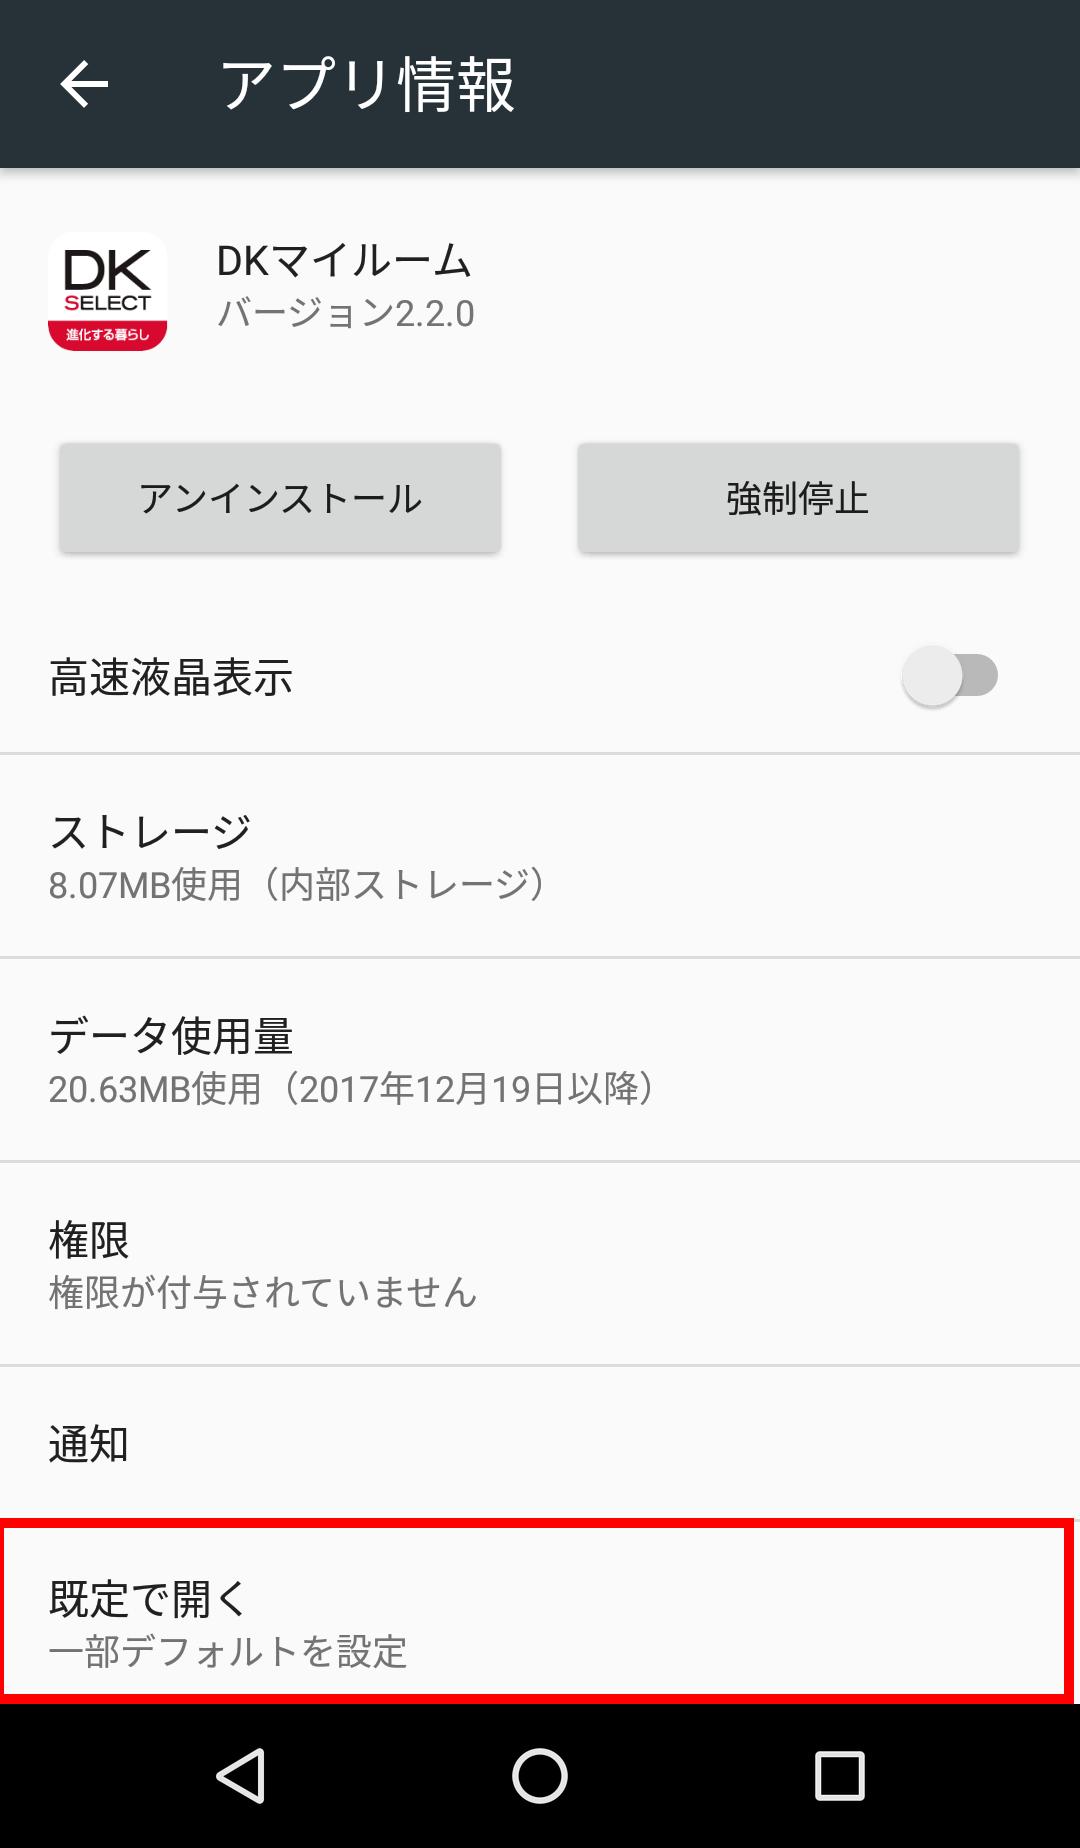 step step4